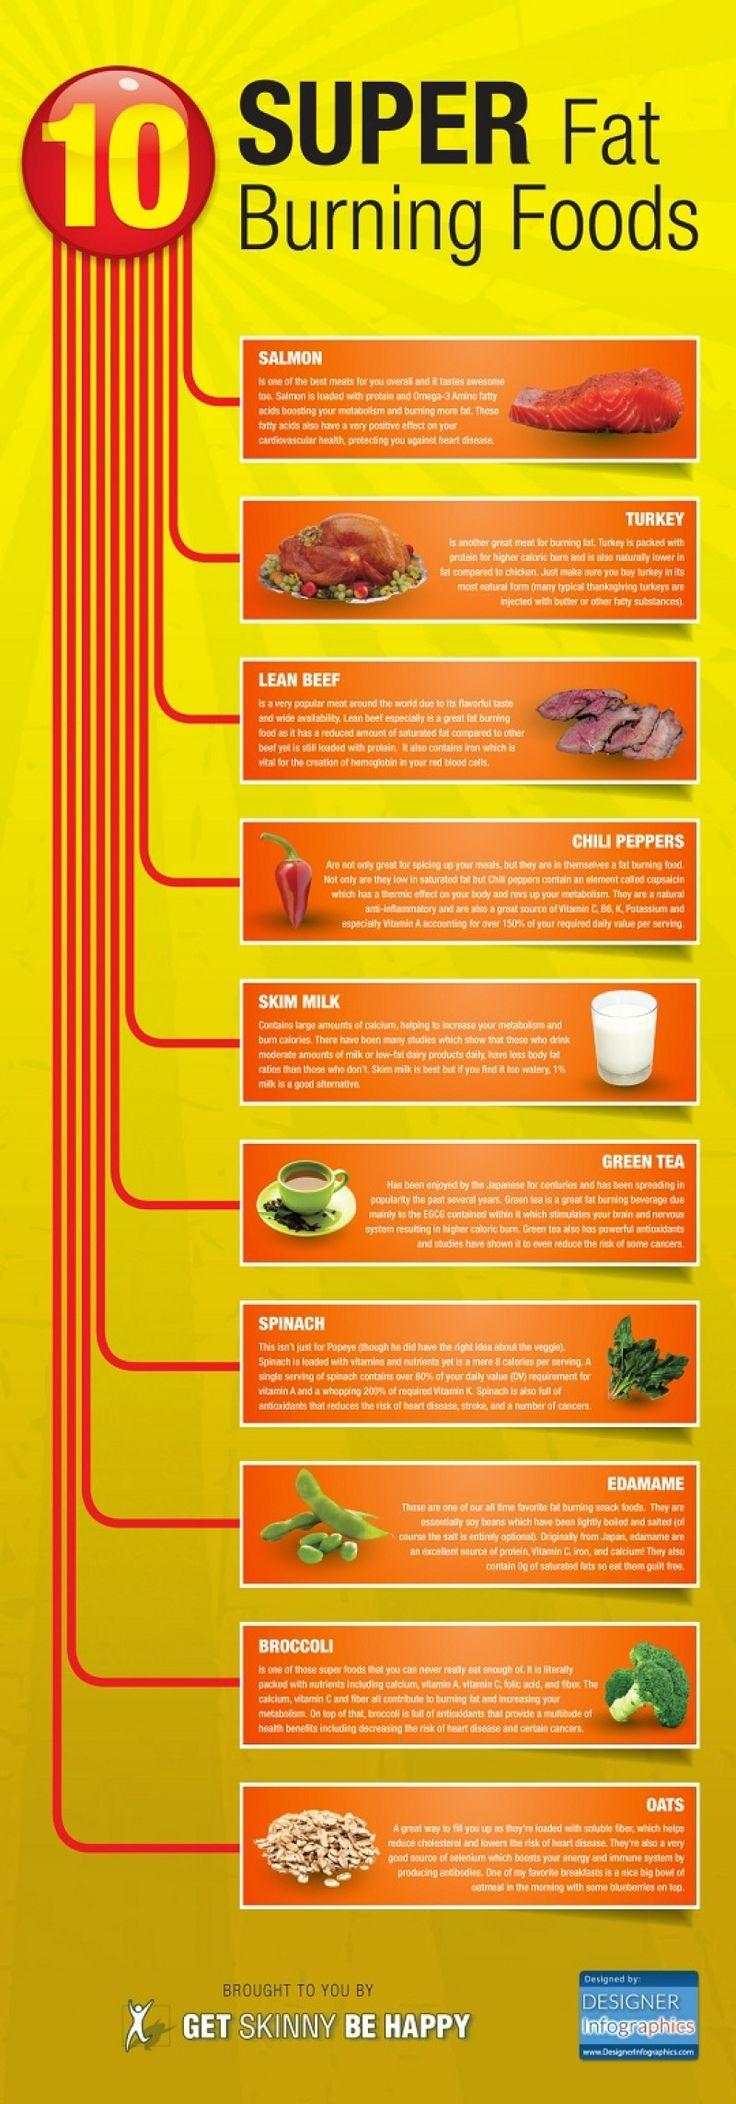 10 Super Fat Burning Foods